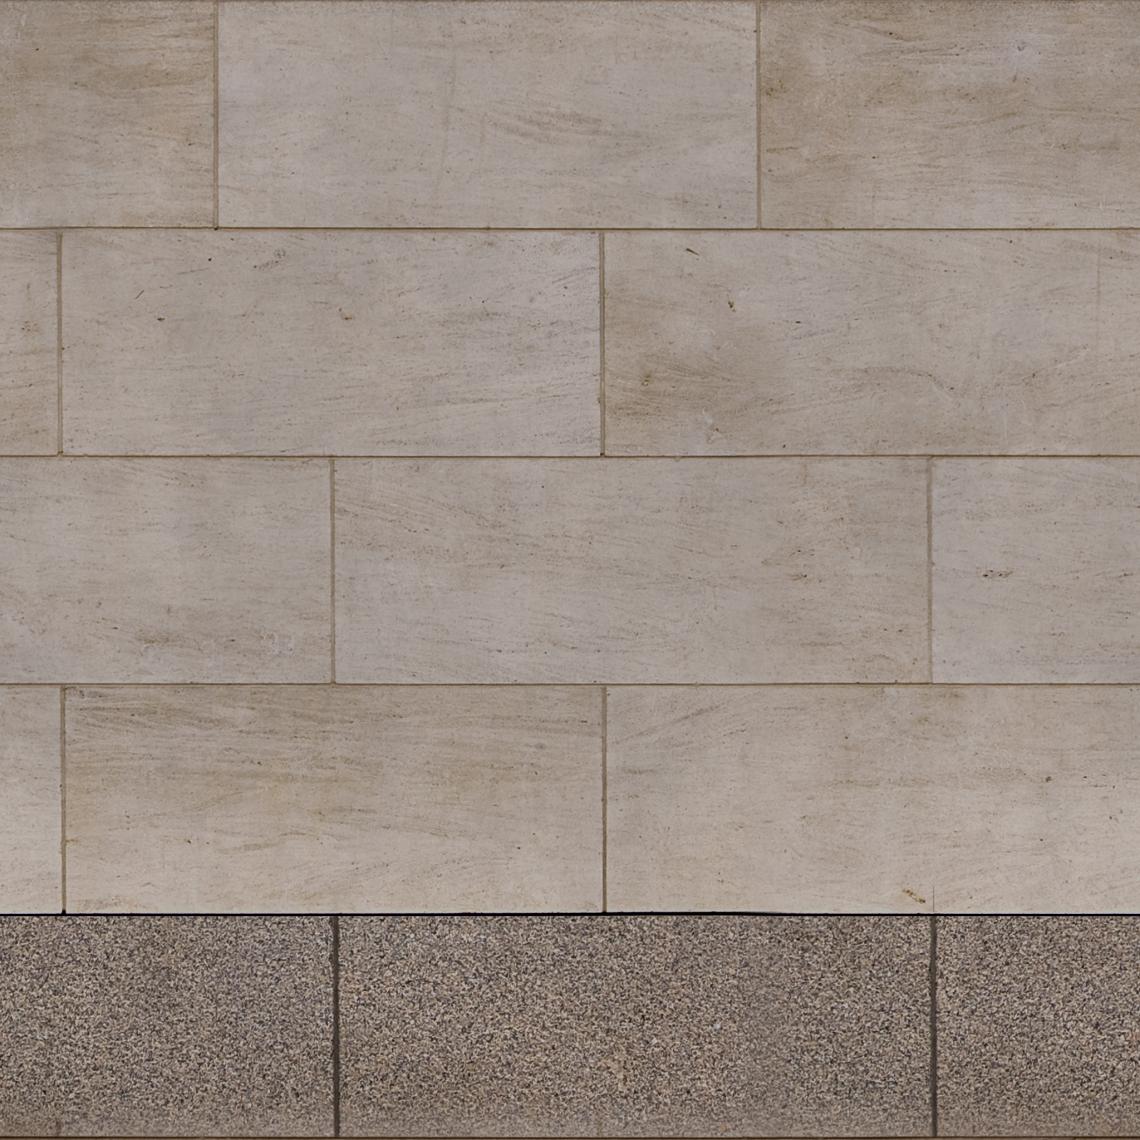 Brick-Large-02-Albedo